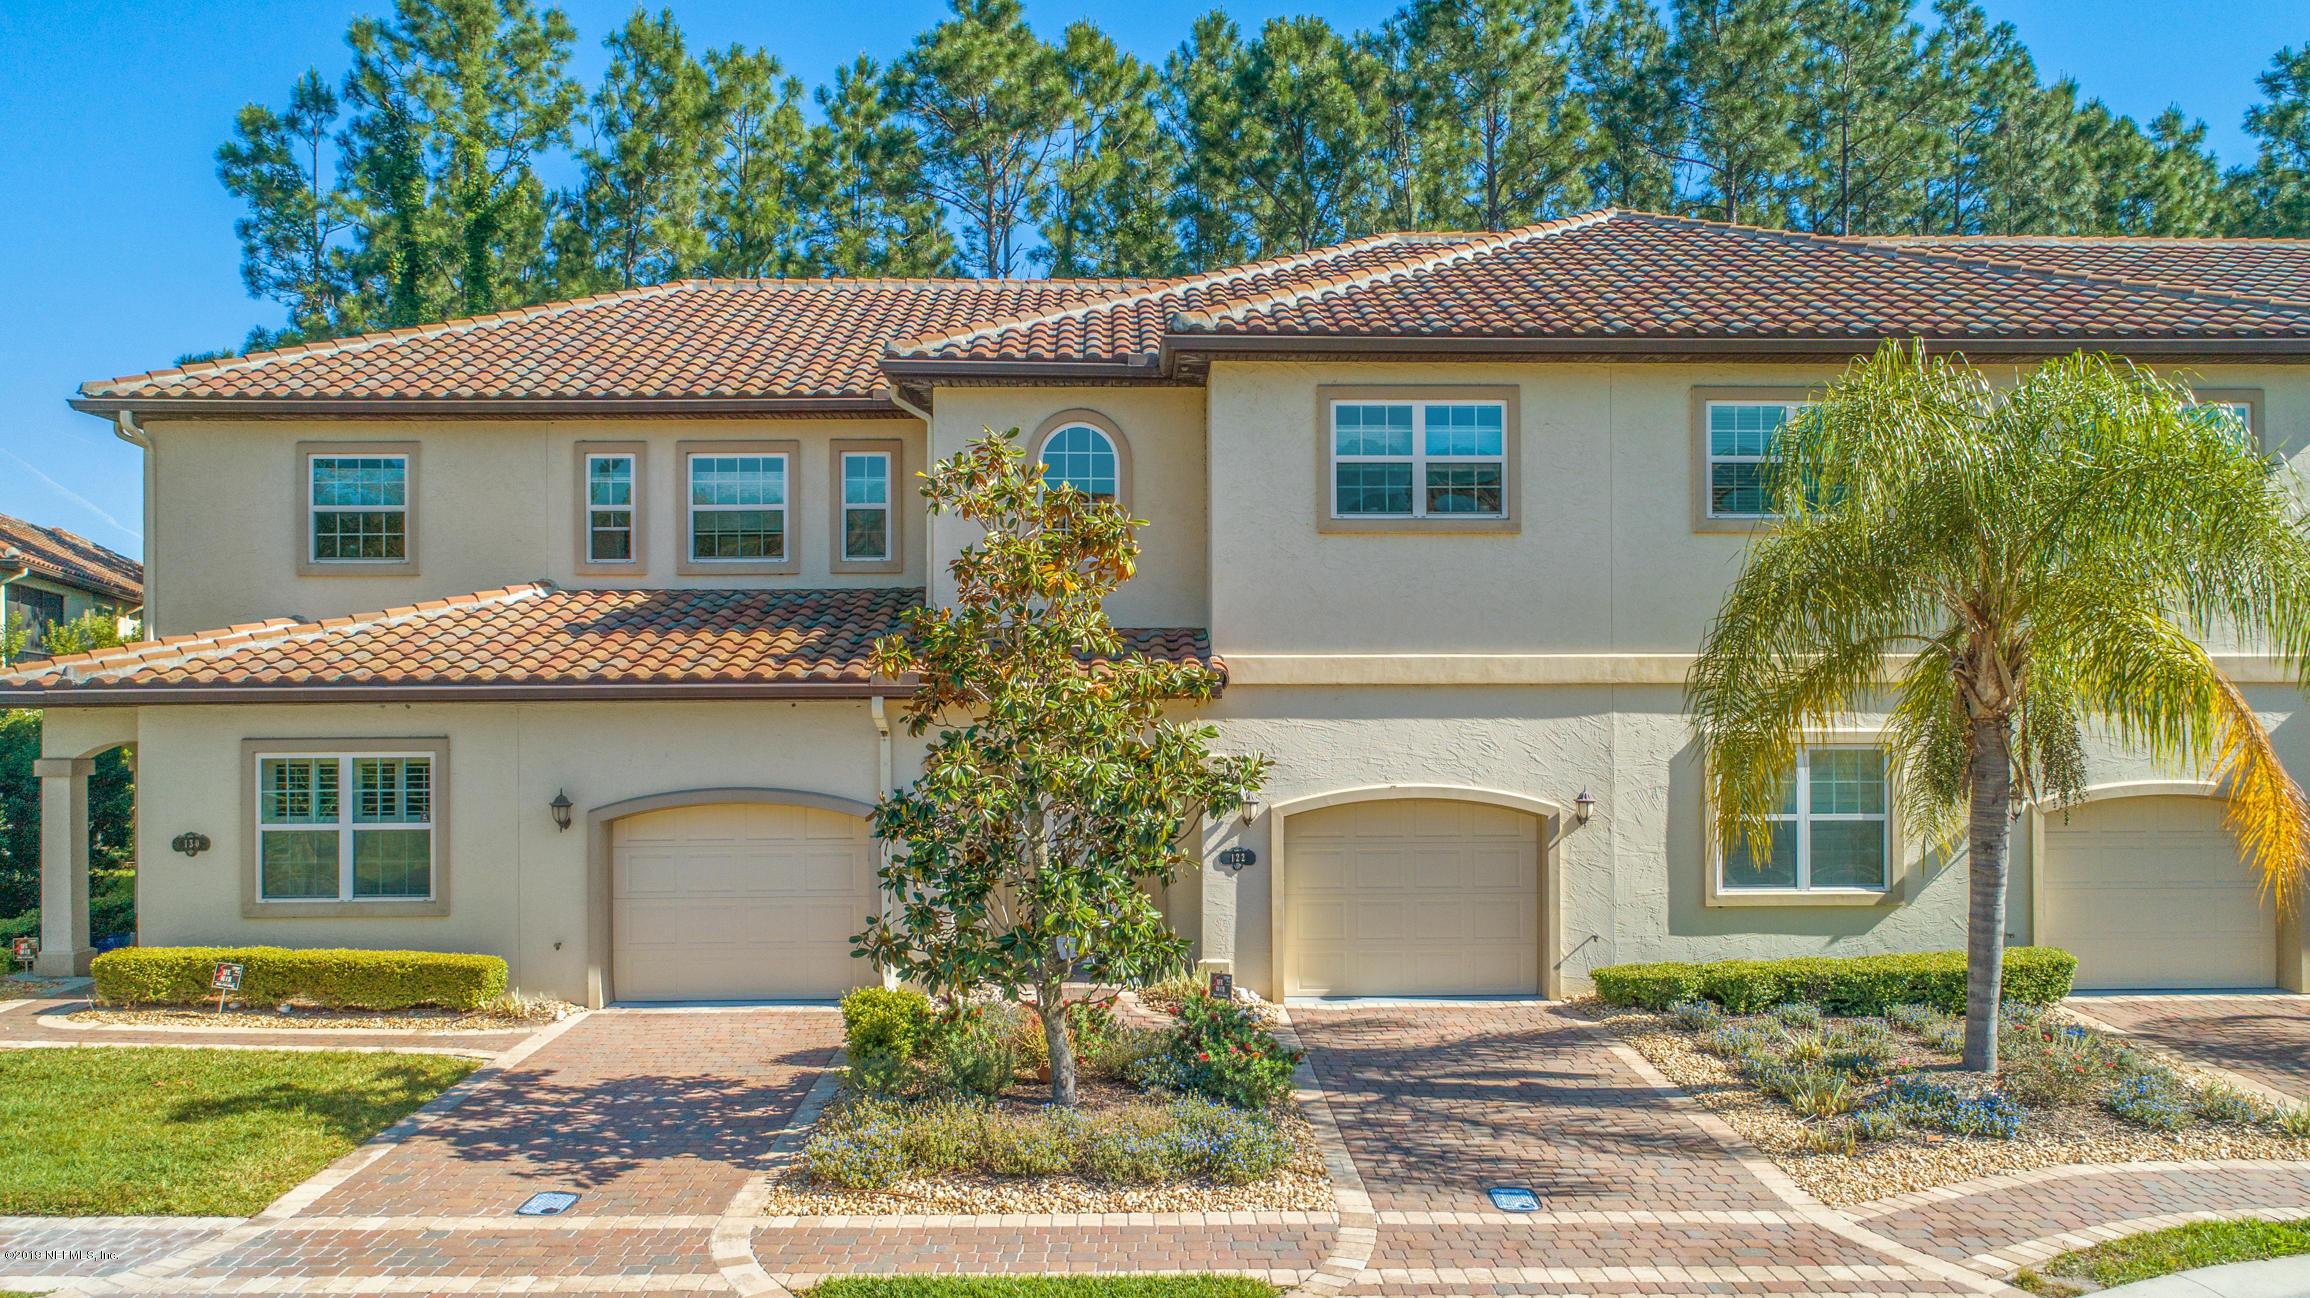 122 GRAND RAVINE, ST AUGUSTINE, FLORIDA 32086, 3 Bedrooms Bedrooms, ,2 BathroomsBathrooms,Condo,For sale,GRAND RAVINE,991852